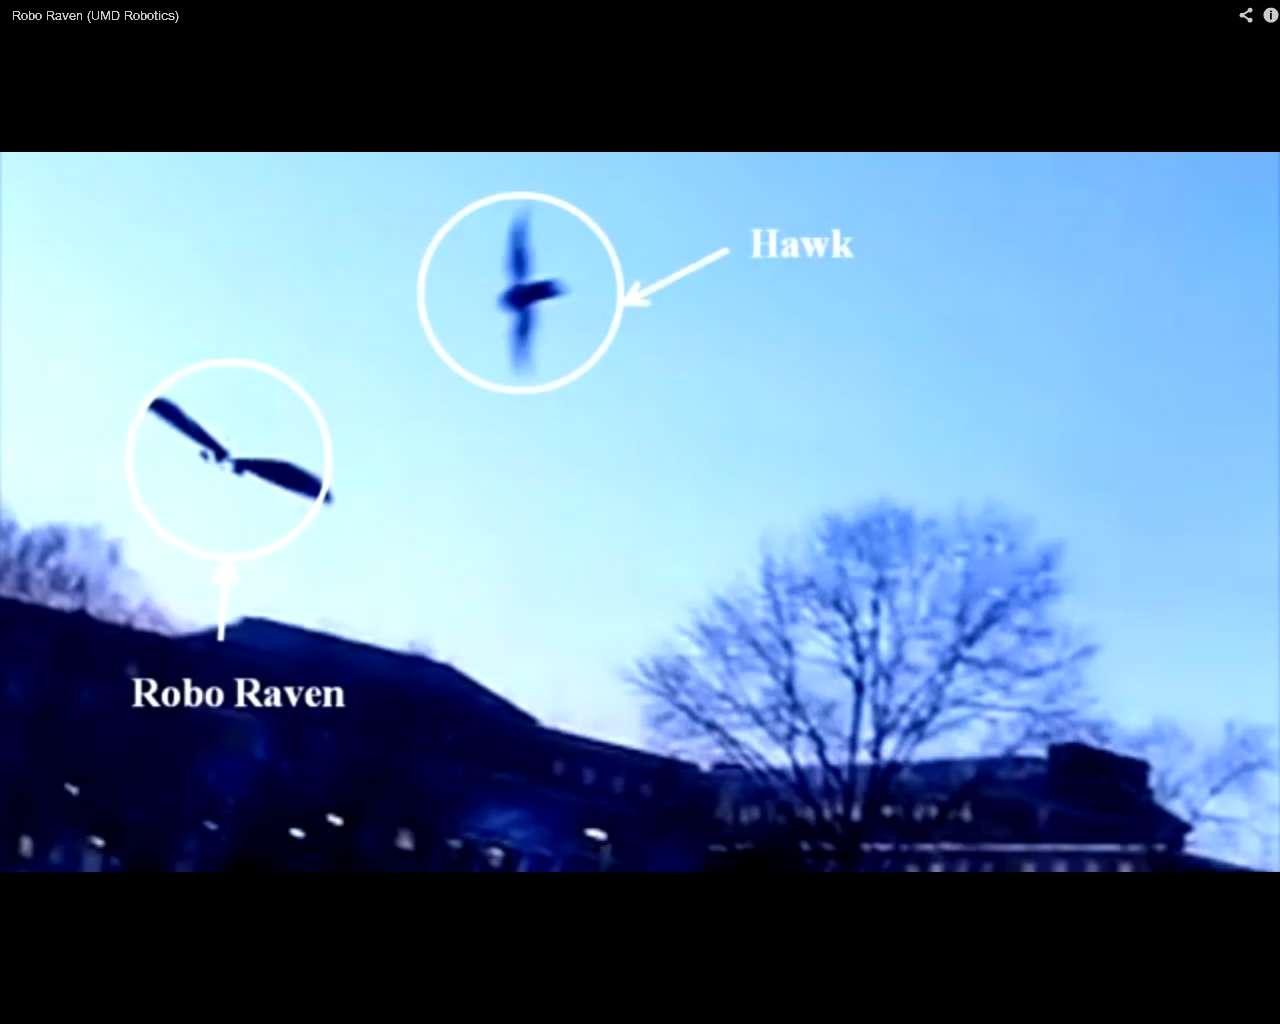 Un faucon attaque Robo Raven en plein vol. © Capture d'écran, UMDRobotics, YouTube